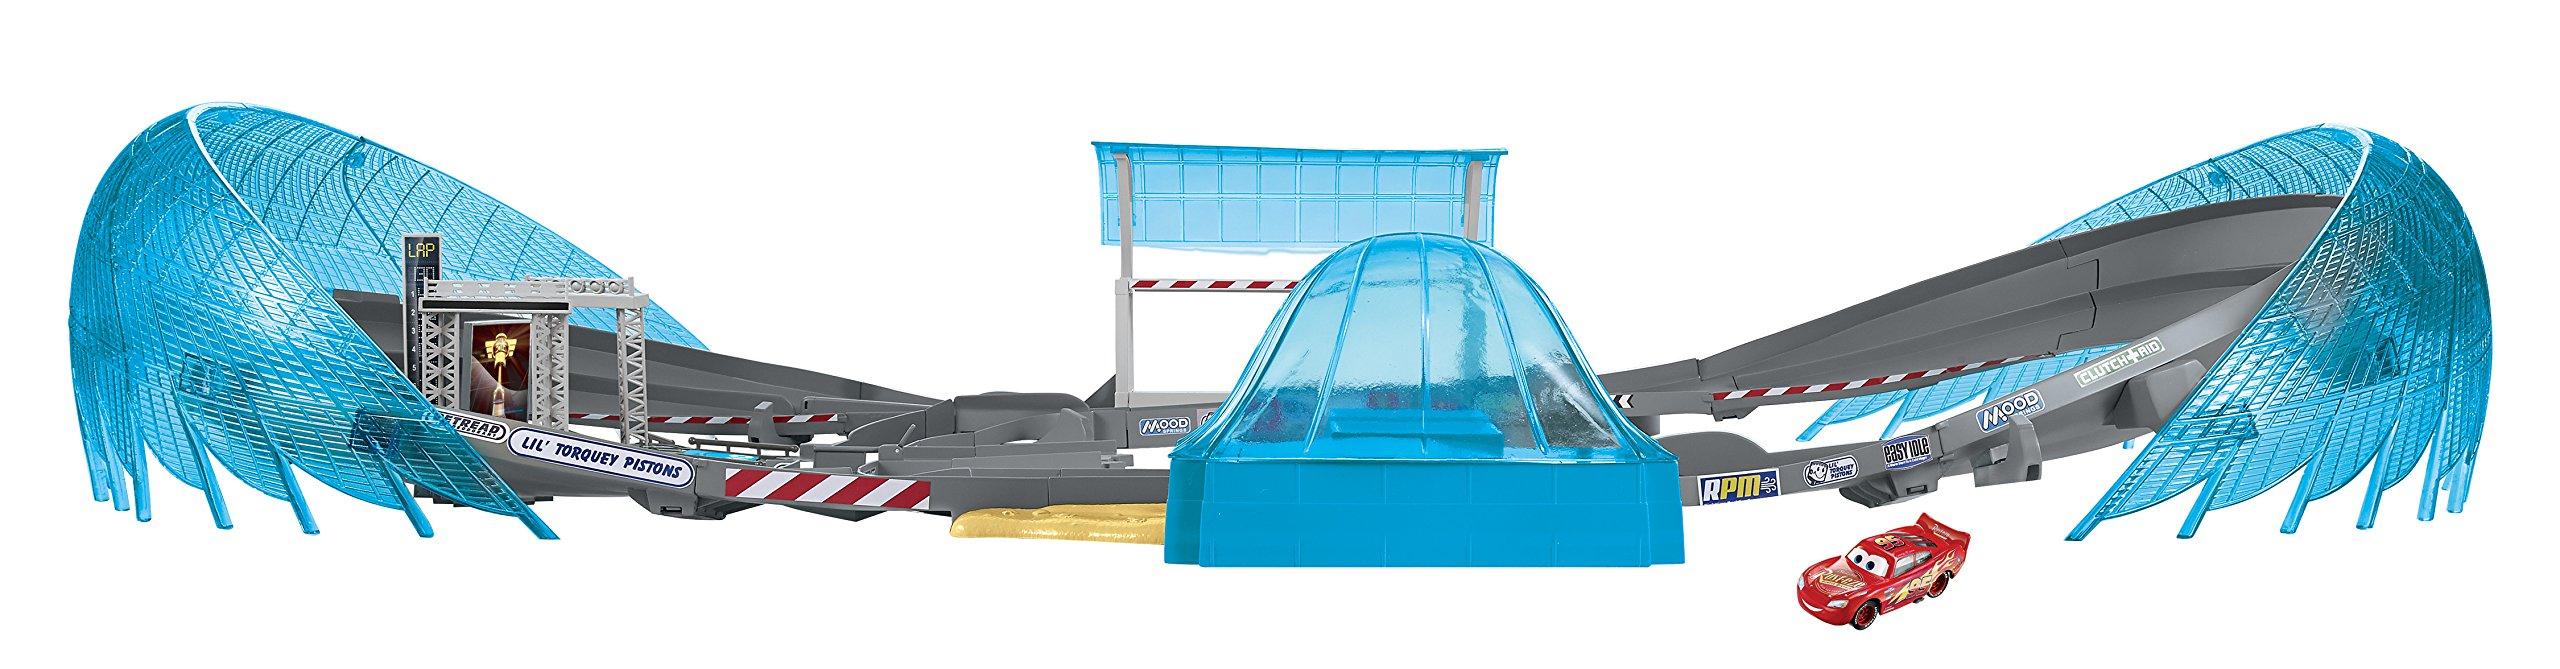 Disney/Pixar Cars 3 Ultimate Florida Speedway Track Set by Disney (Image #14)